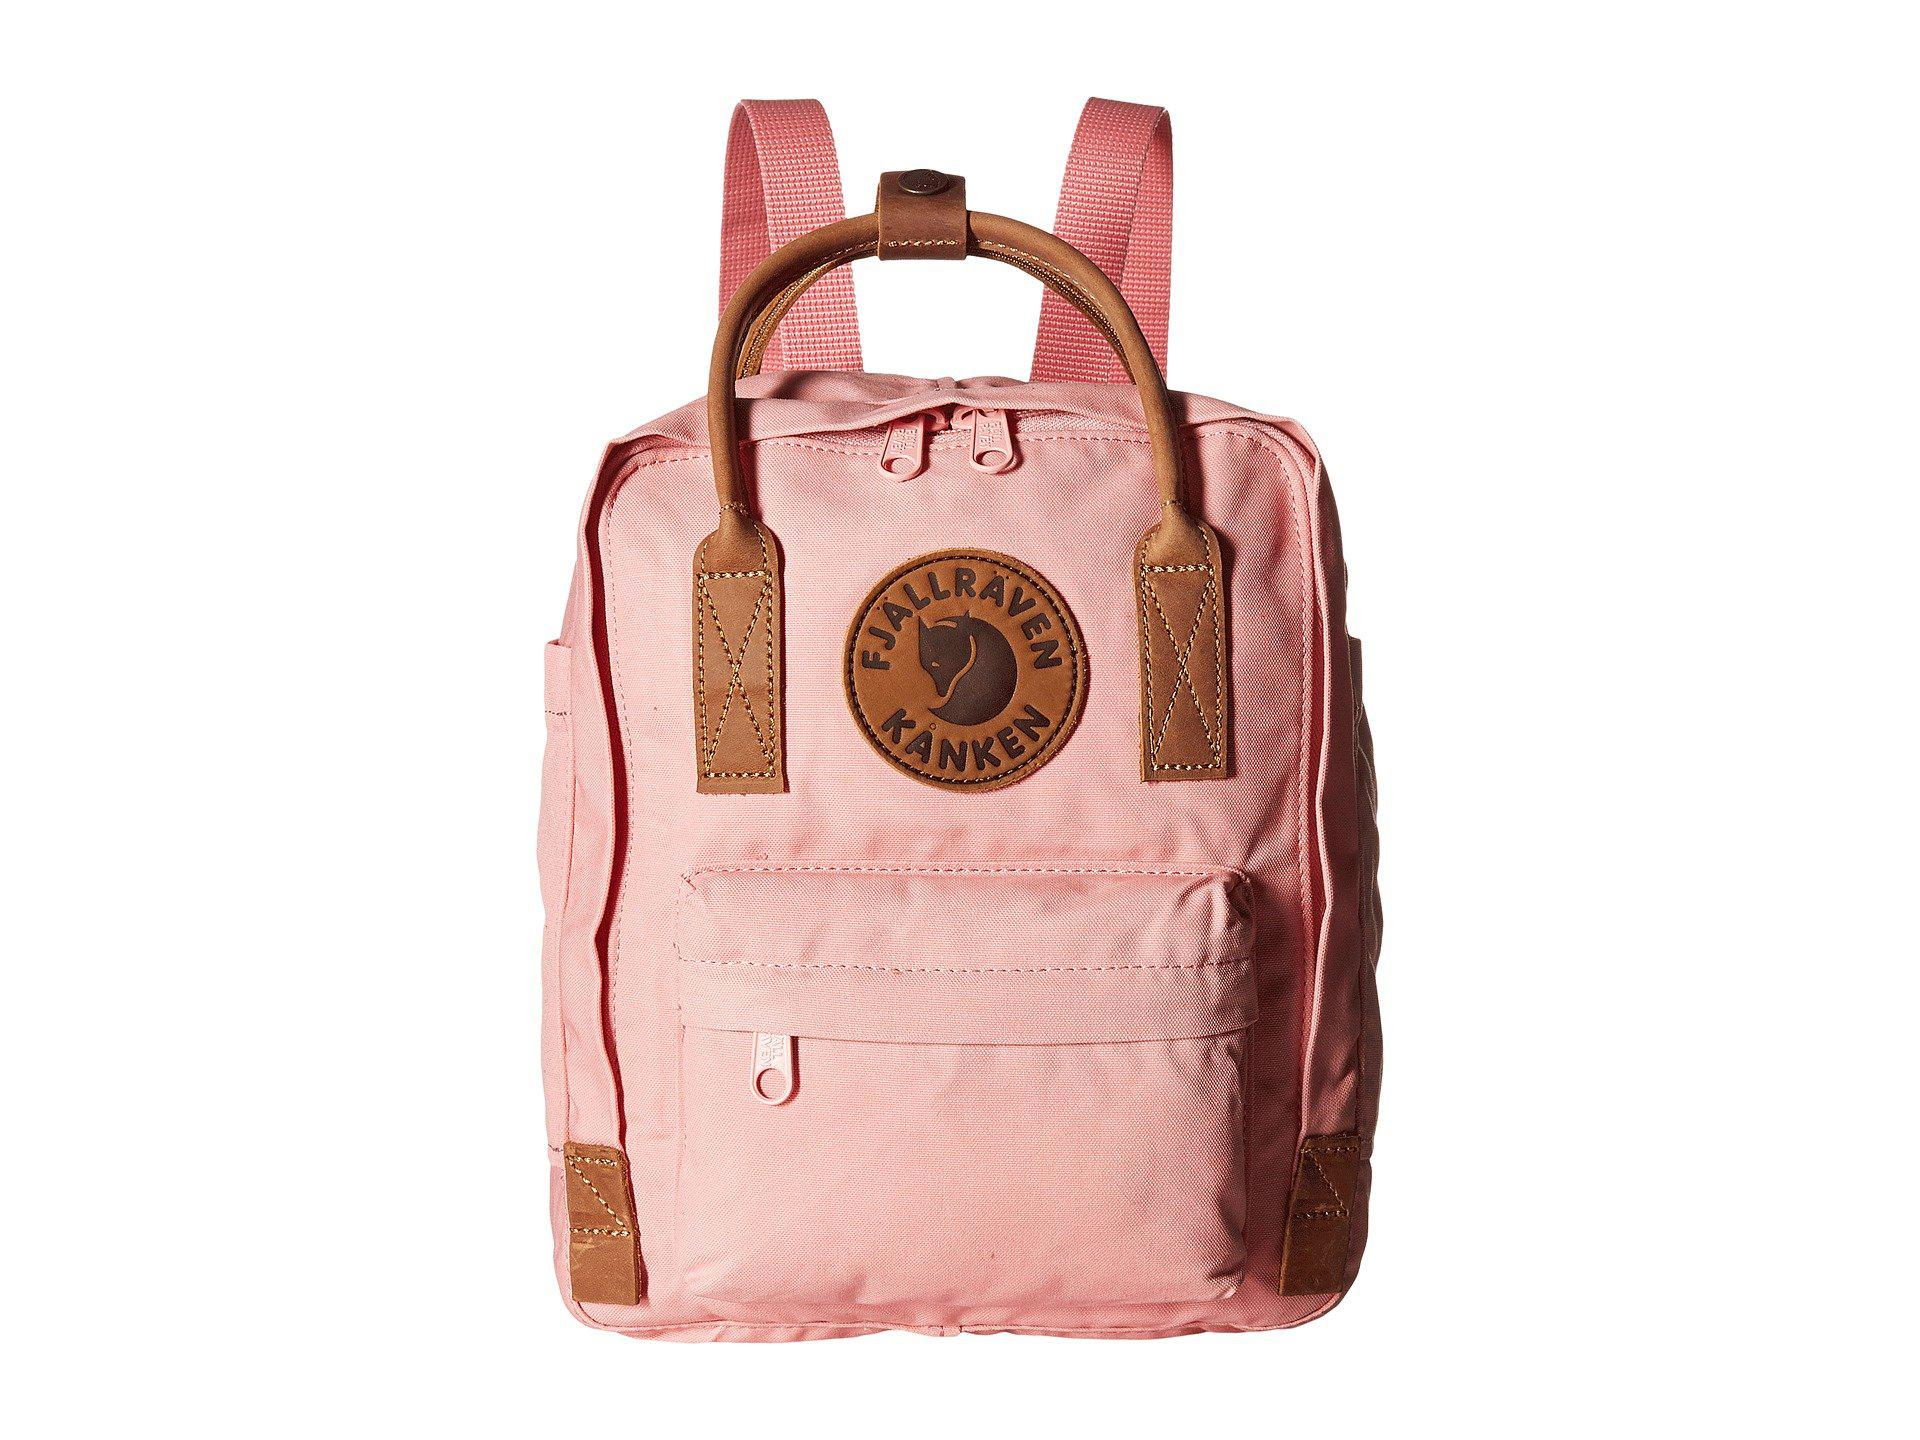 1e343bd95c5 Fjallraven Kanken No. 2 Mini (pink) Bags in Pink - Lyst